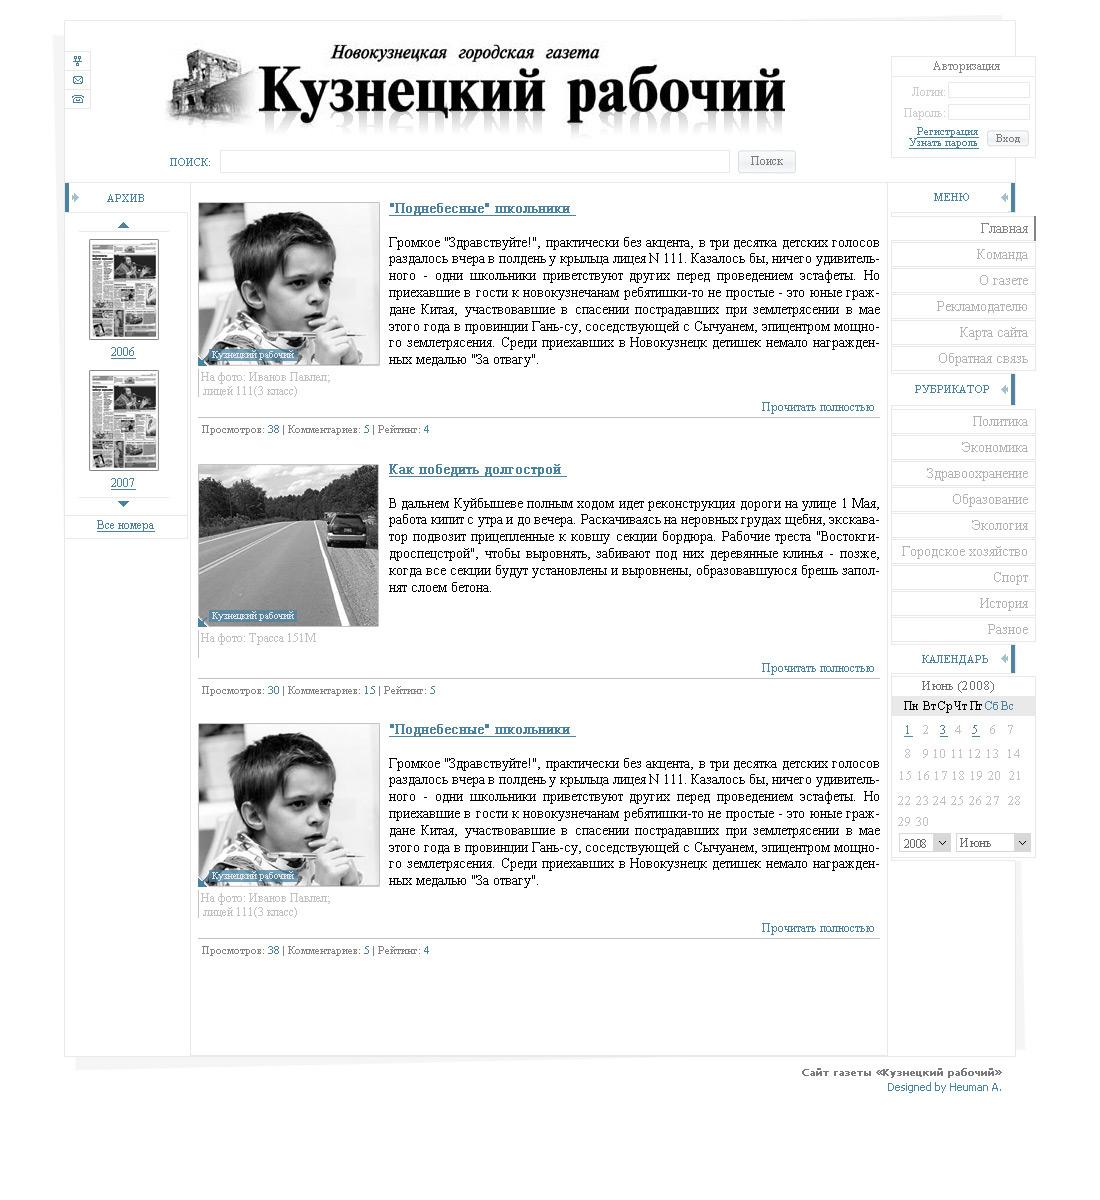 Кузнецкий рабочий - газета